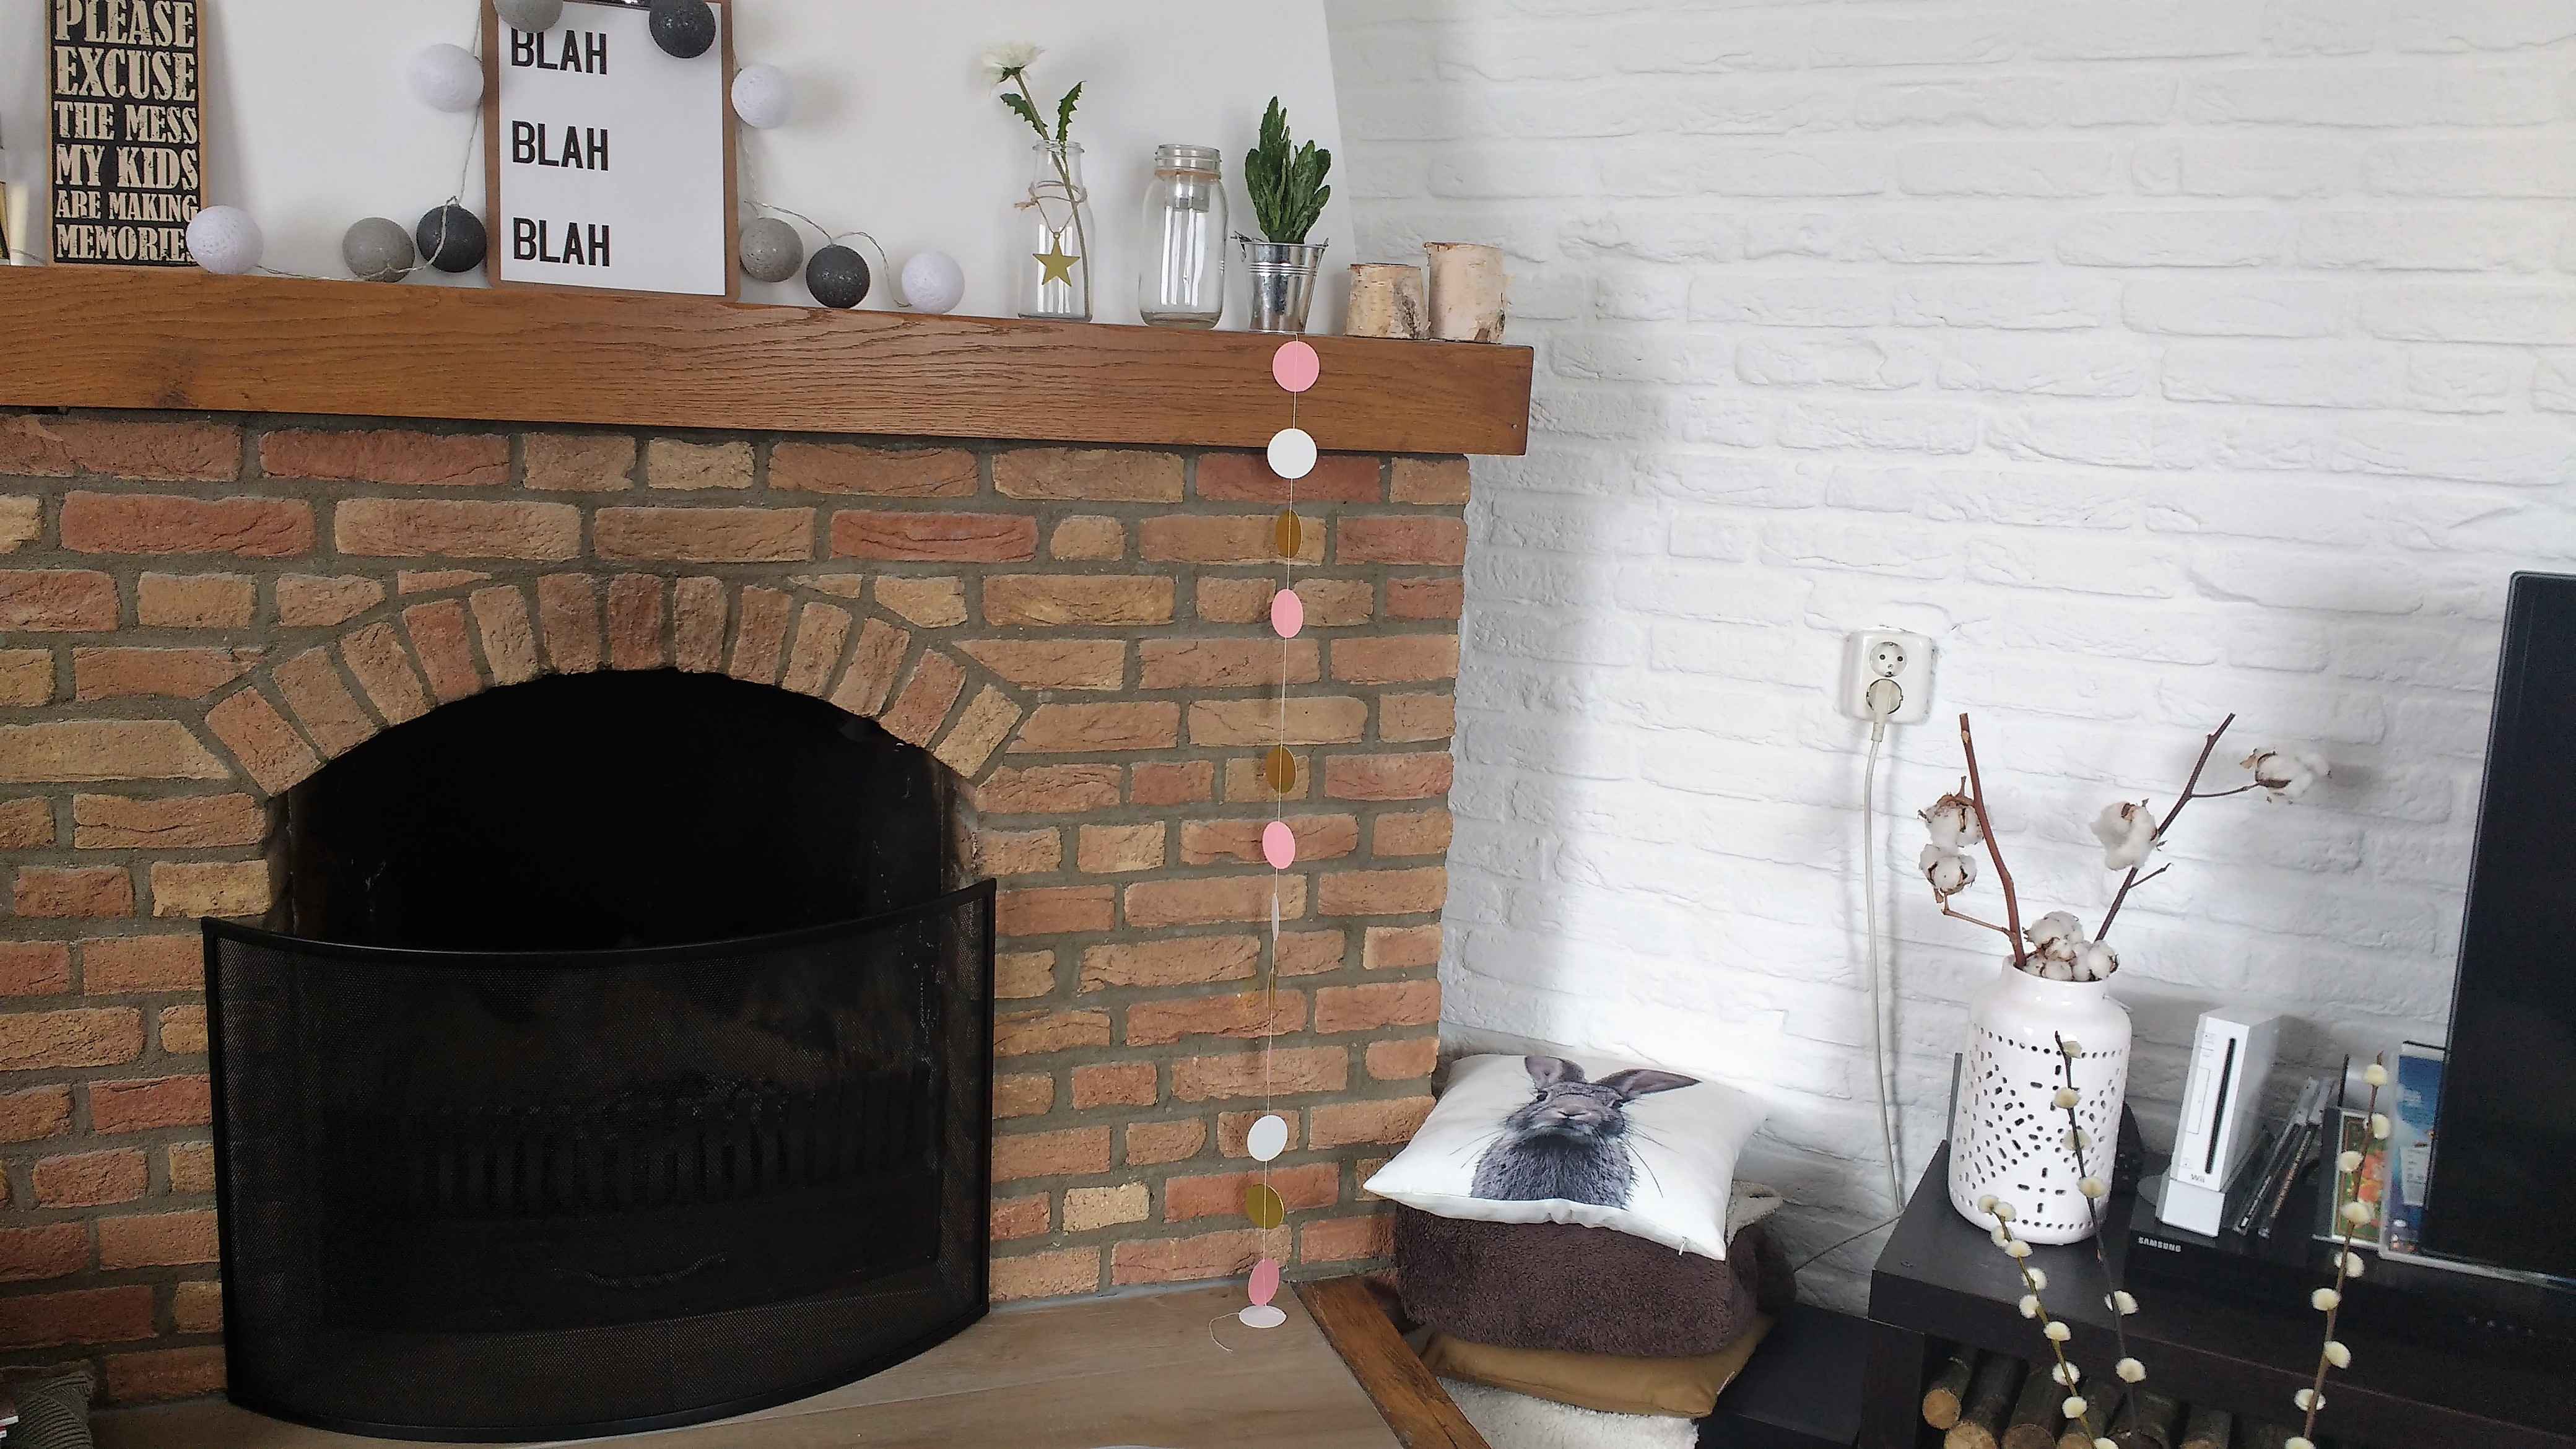 interieur, Bomont, accessoires, wonen, woonkamer, woonitems, woonblog, home, living, blog, mamablog, lalog, La Log.nl